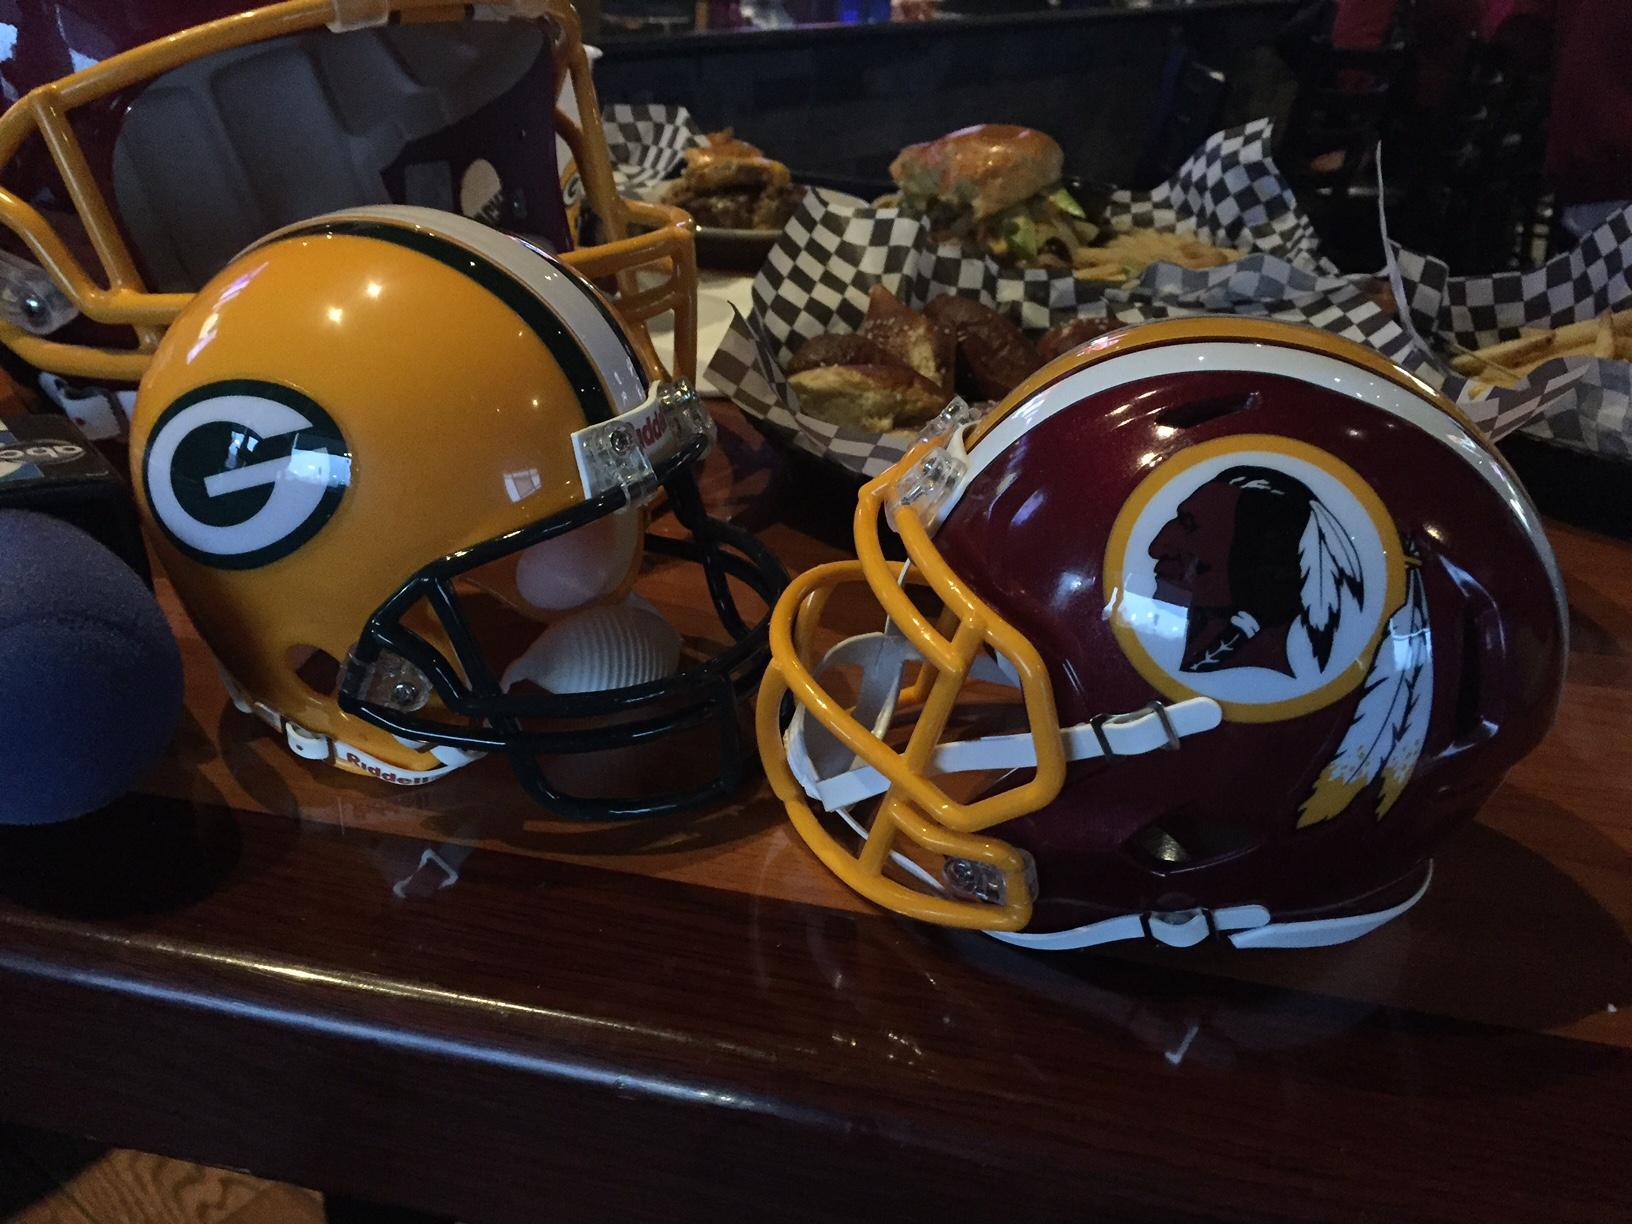 Big Redskins-Packers game equals big screens, big food and drink specials